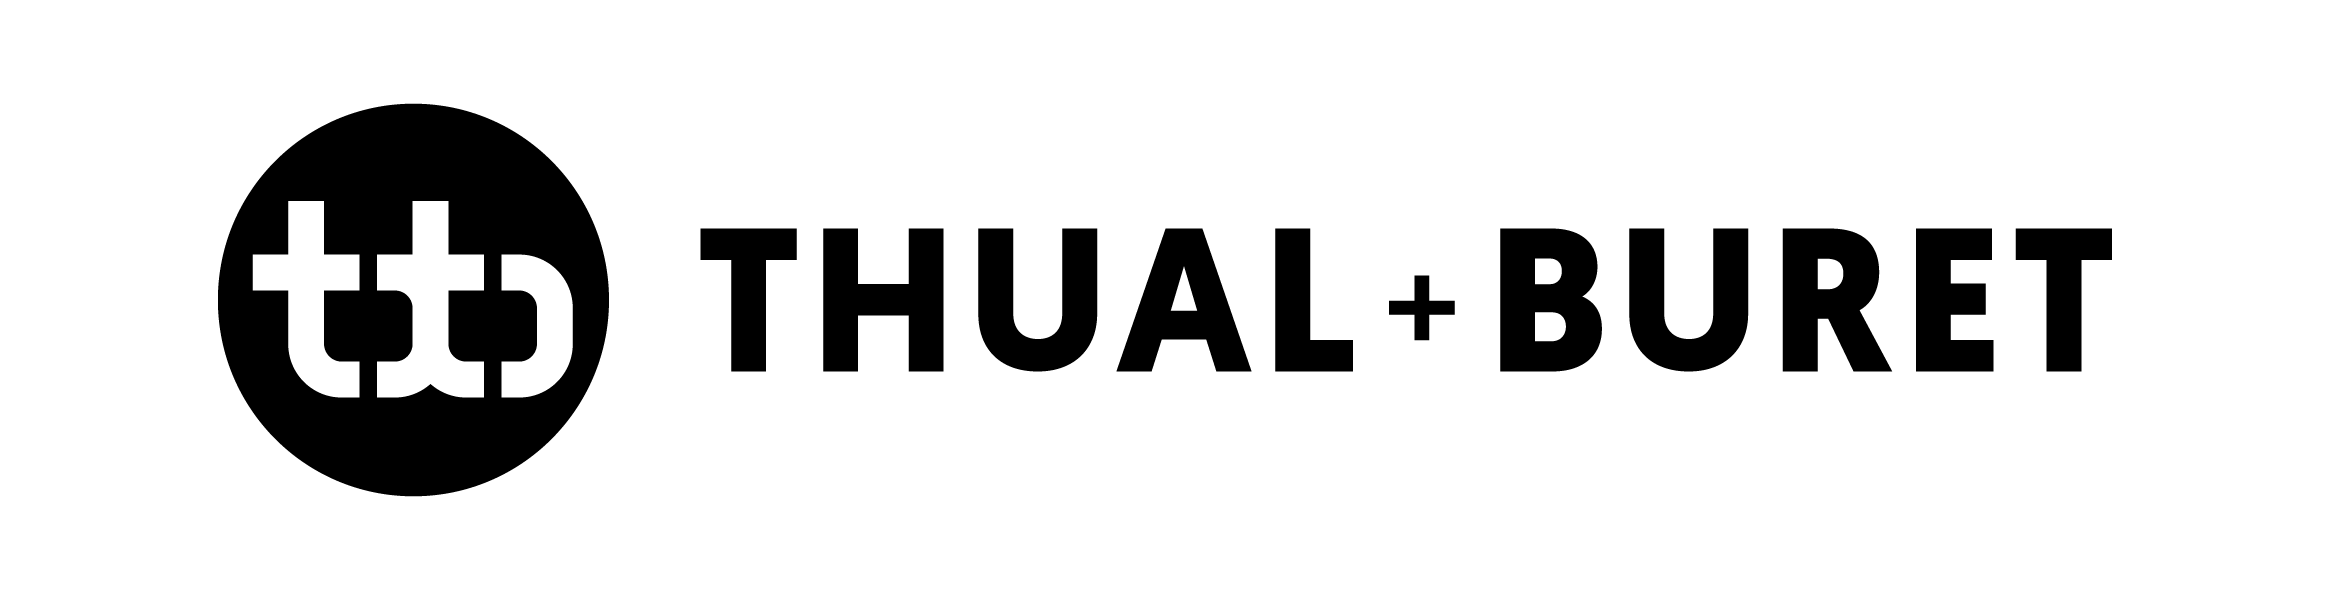 THUAL+BURET